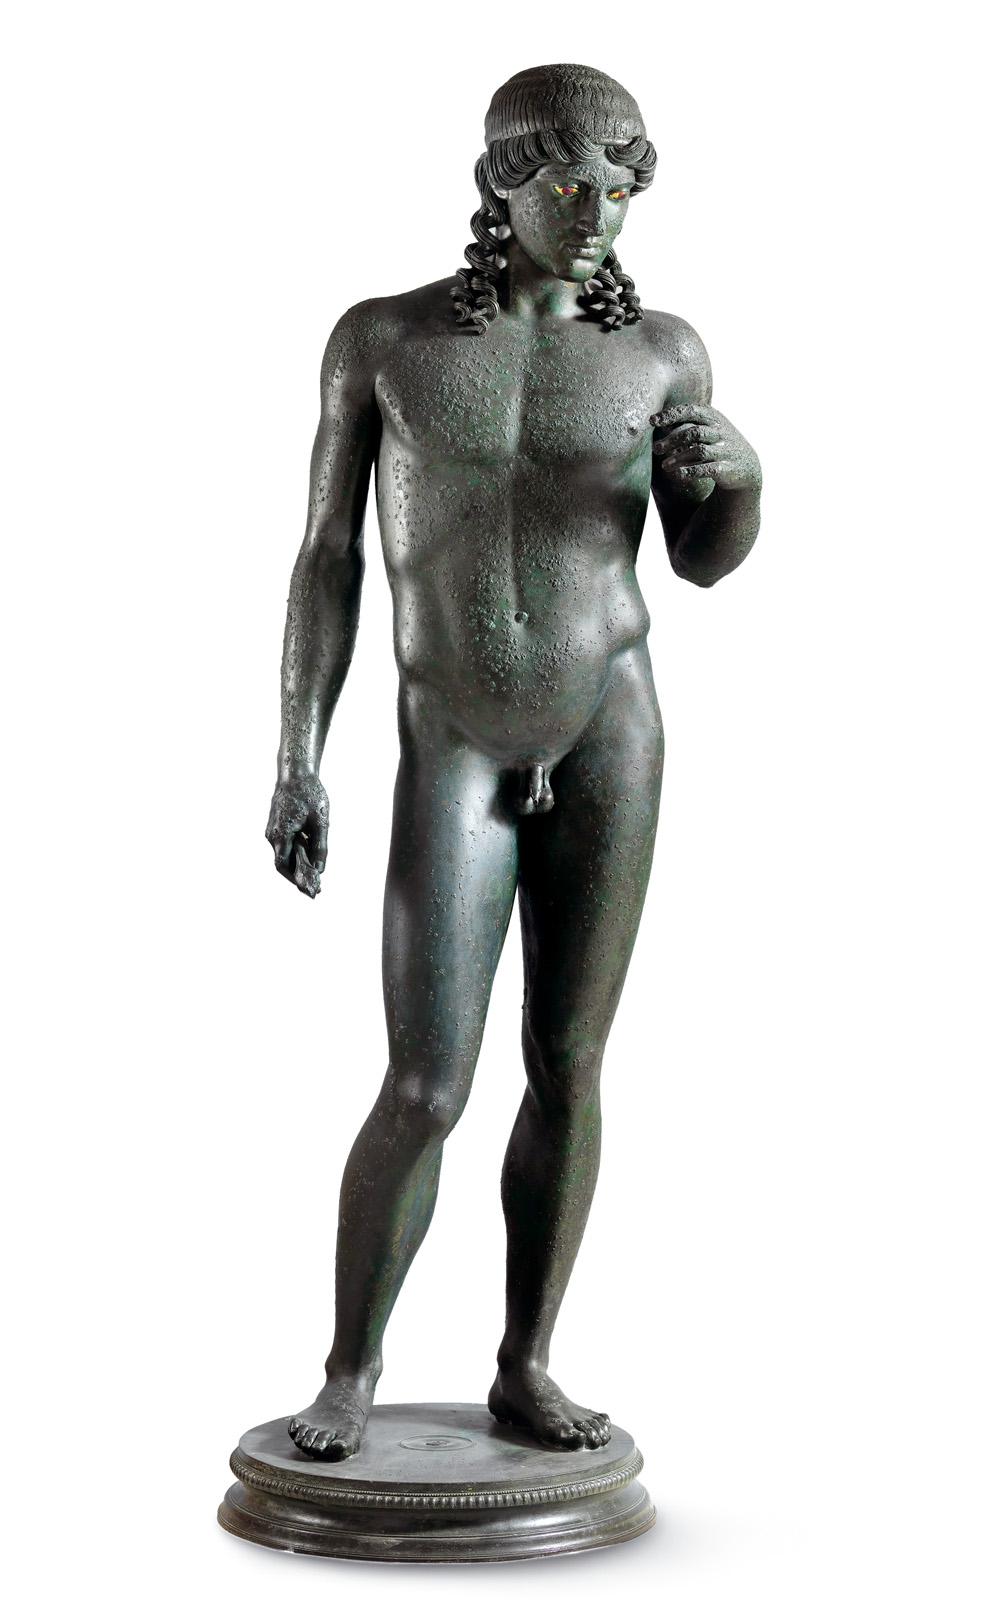 Pompeji: Statue des Apollon Kitharoedus, aus der Casa del Citarista, Spätes 1. Jahrhundert v. Chr., nach 50 v. Chr., Archäologisches Nationalmuseum Neapel